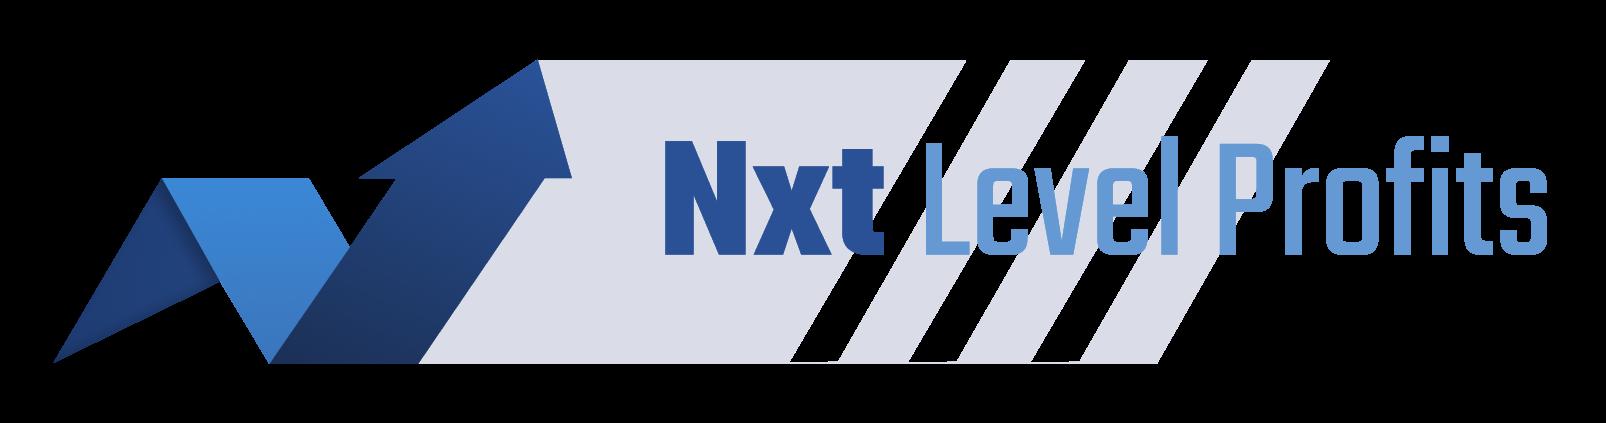 Nxt Level Profits